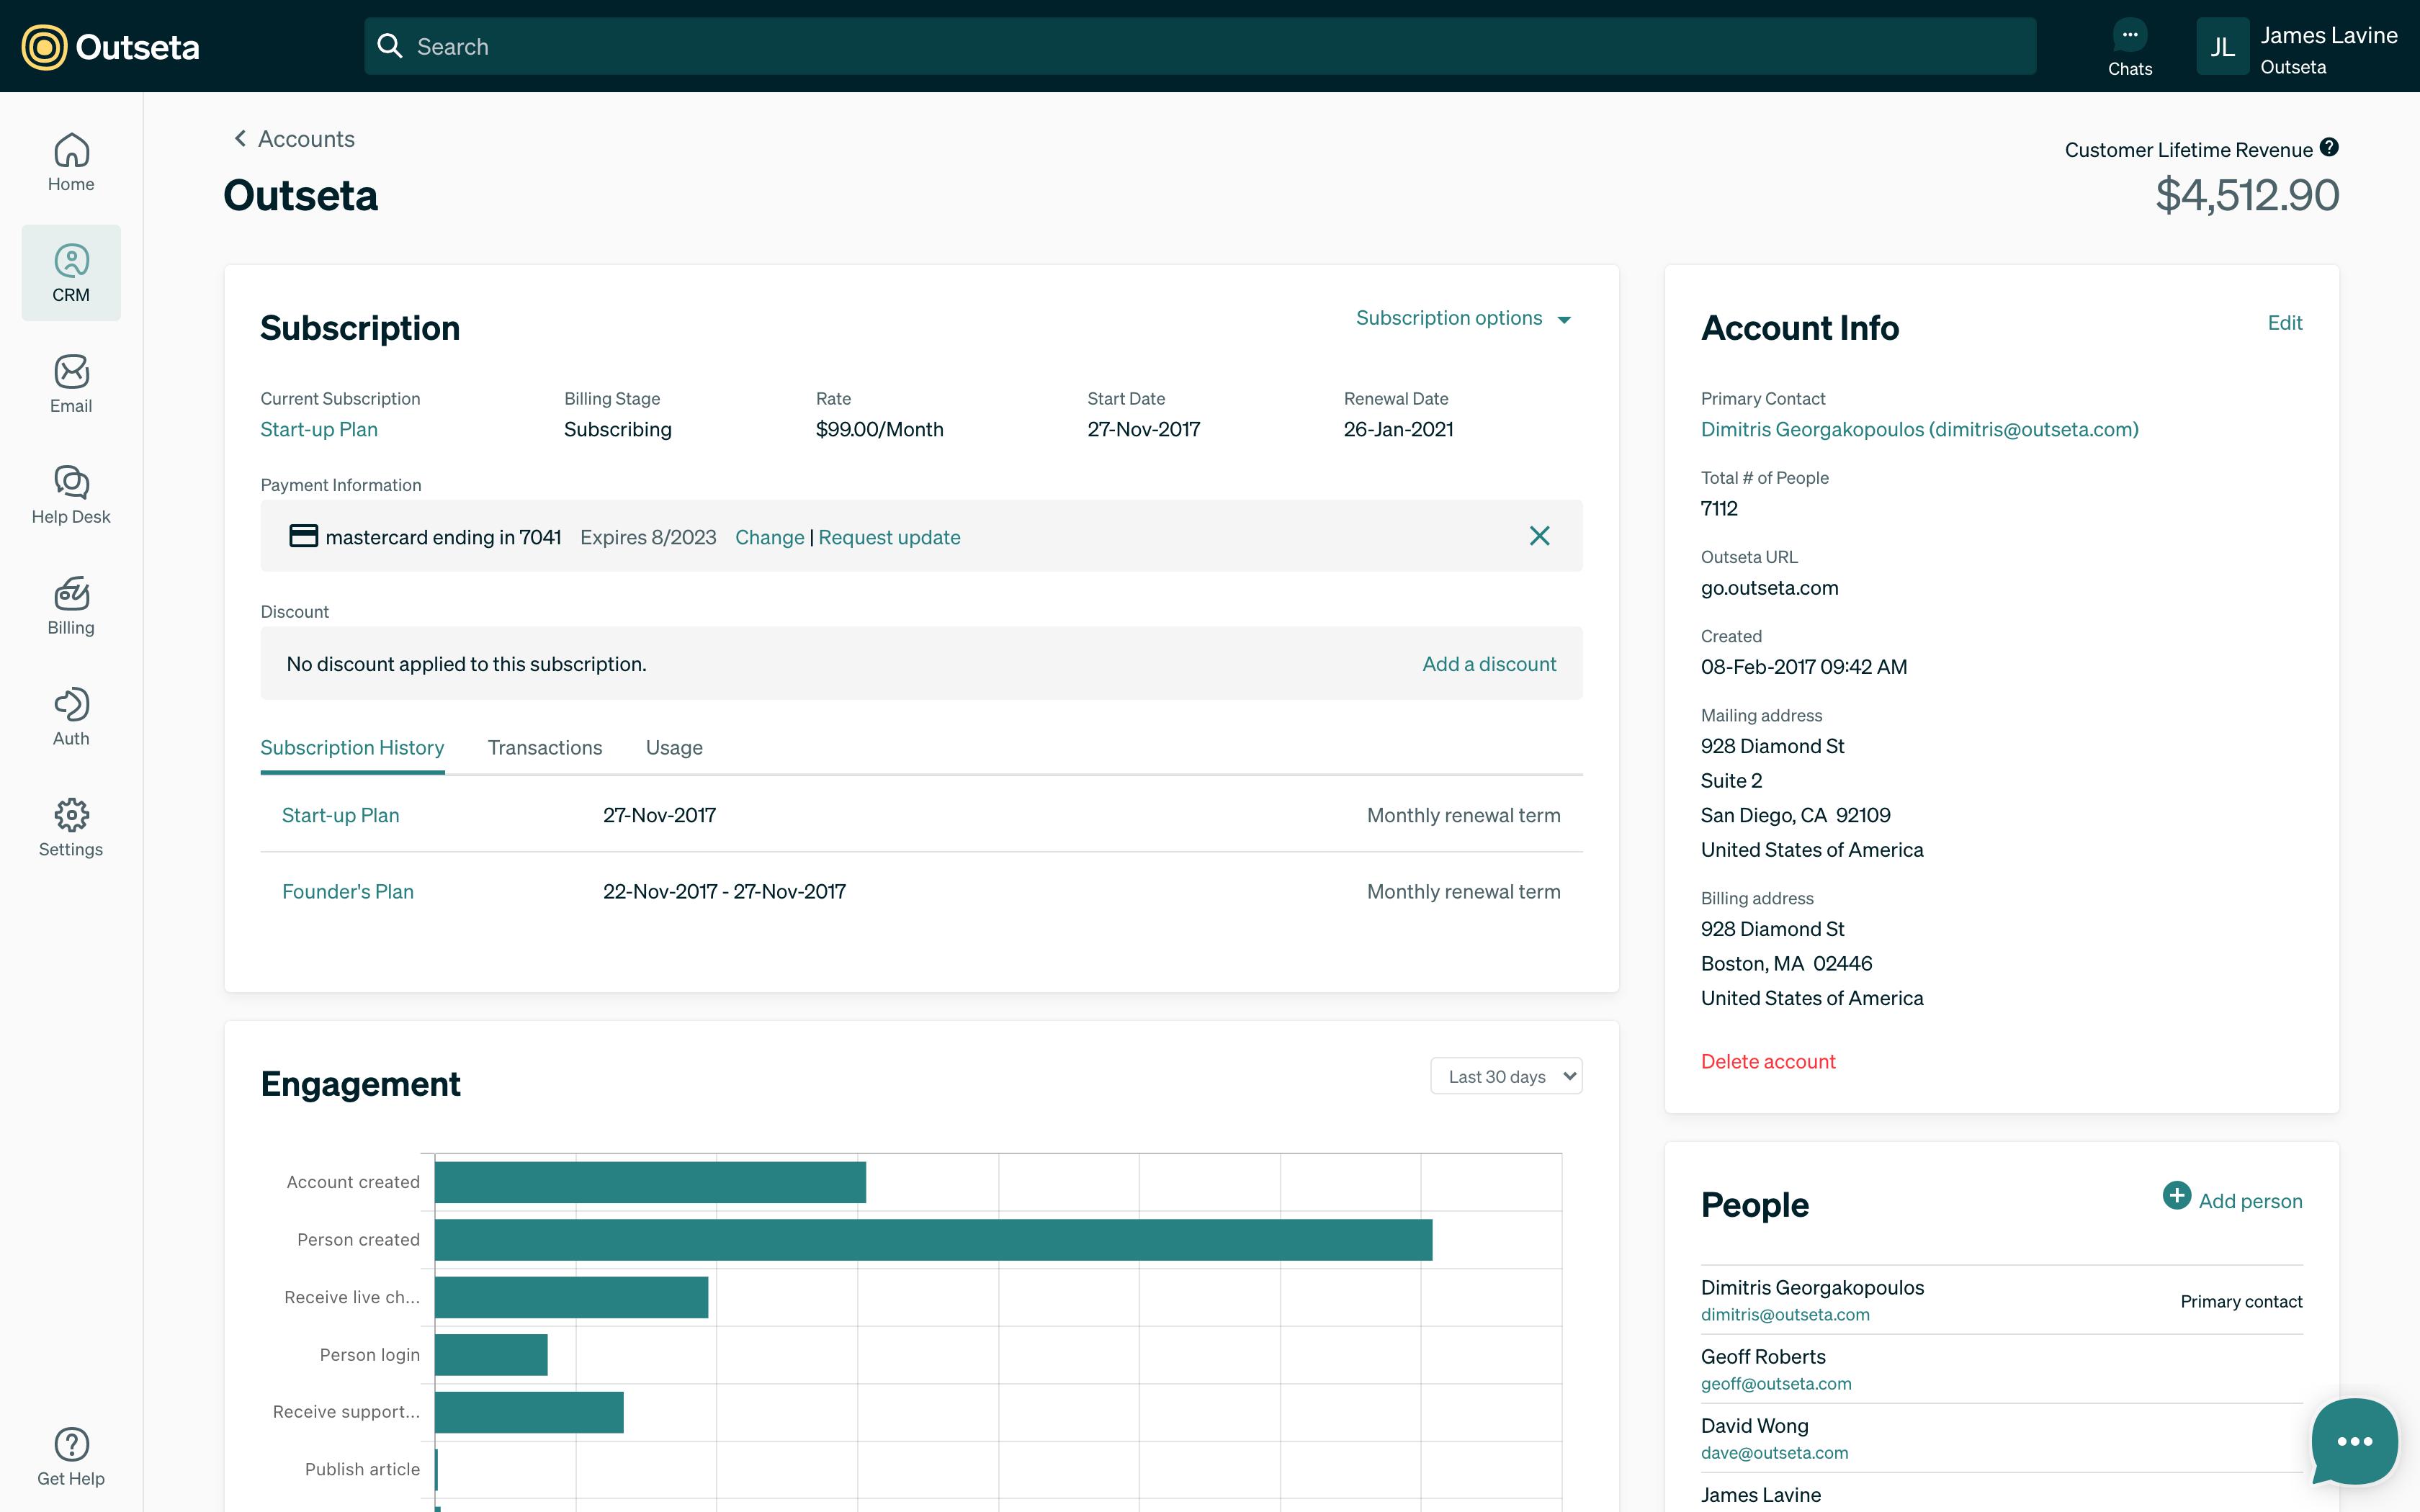 Screenshot of the account detail screen.